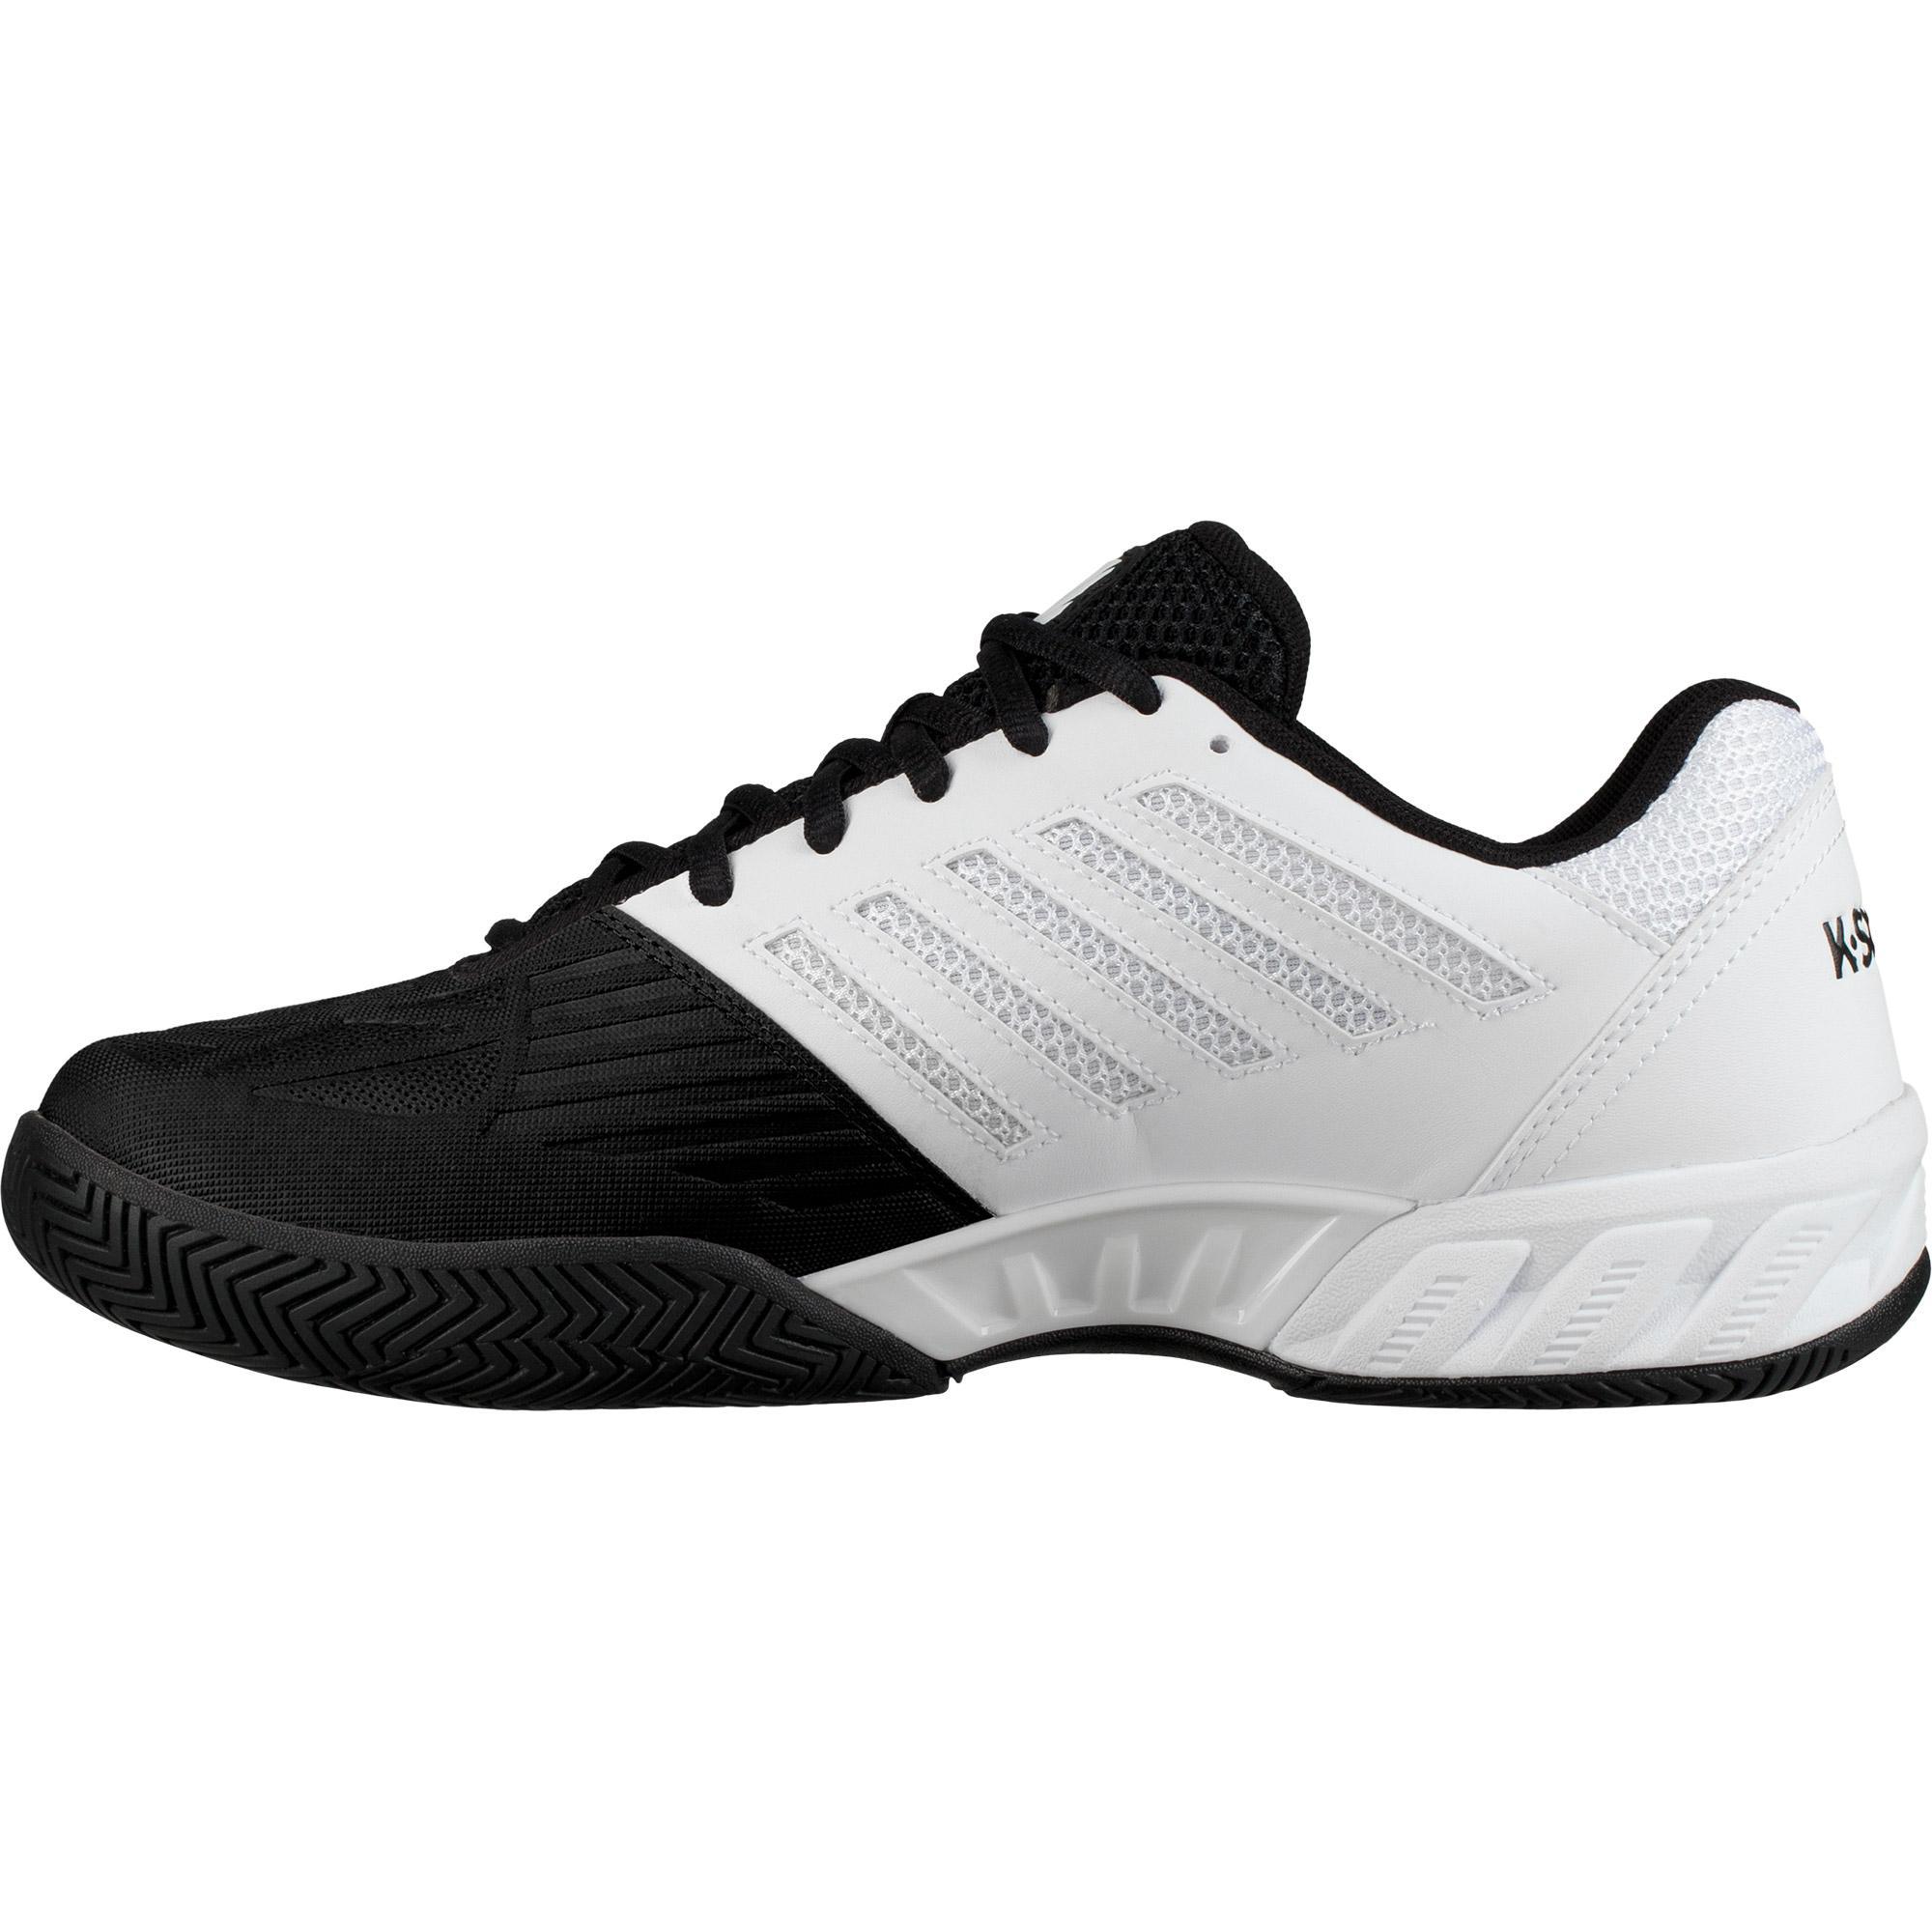 K-Swiss Mens BigShot Light 3 Tennis Shoes - White/Black - Tennisnuts.com